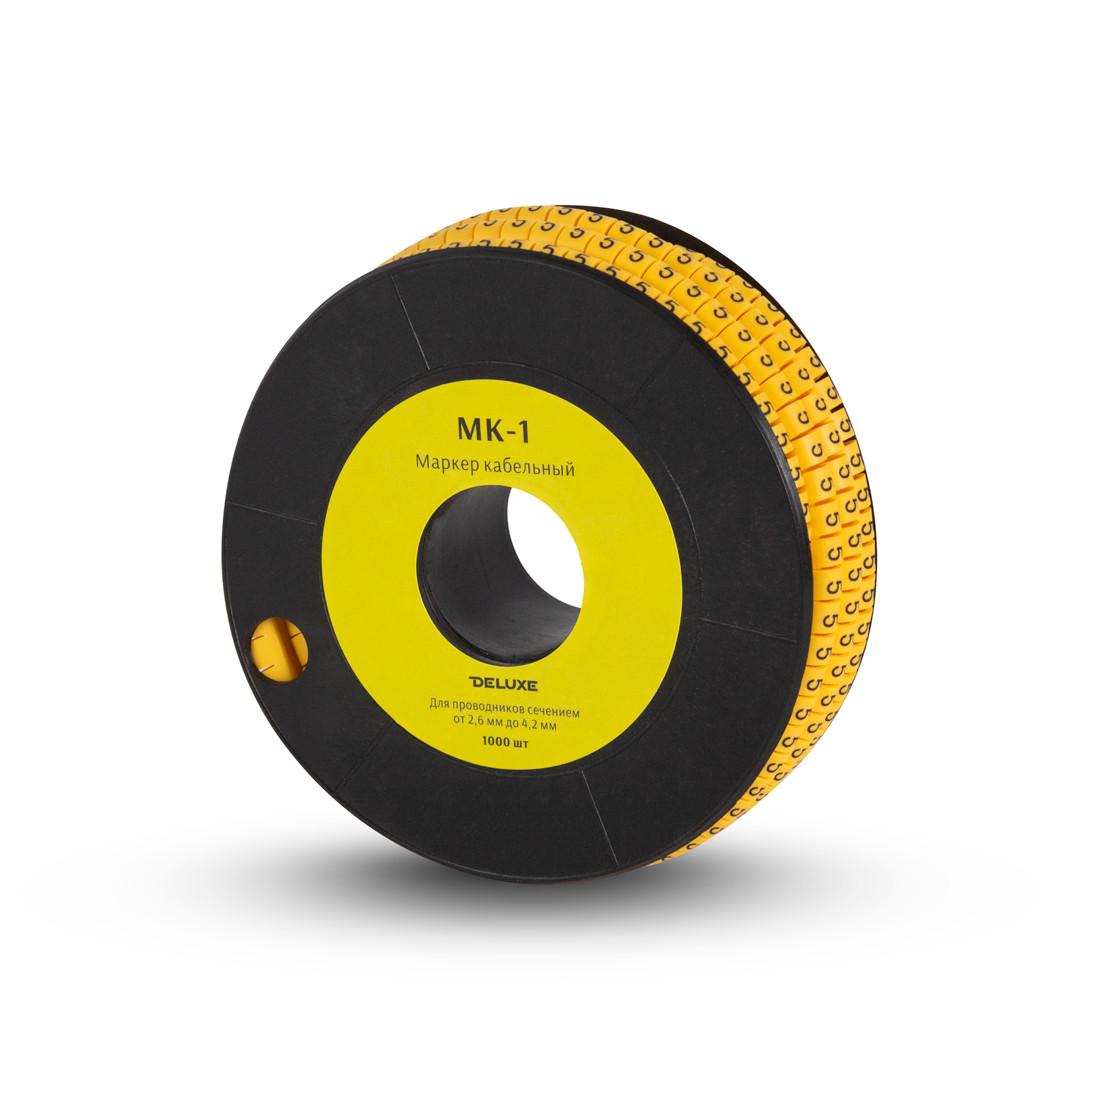 "Маркер кабельный Deluxe МК-1 (2.6-42 мм) символ ""B"" (1000 шт/упак.)"